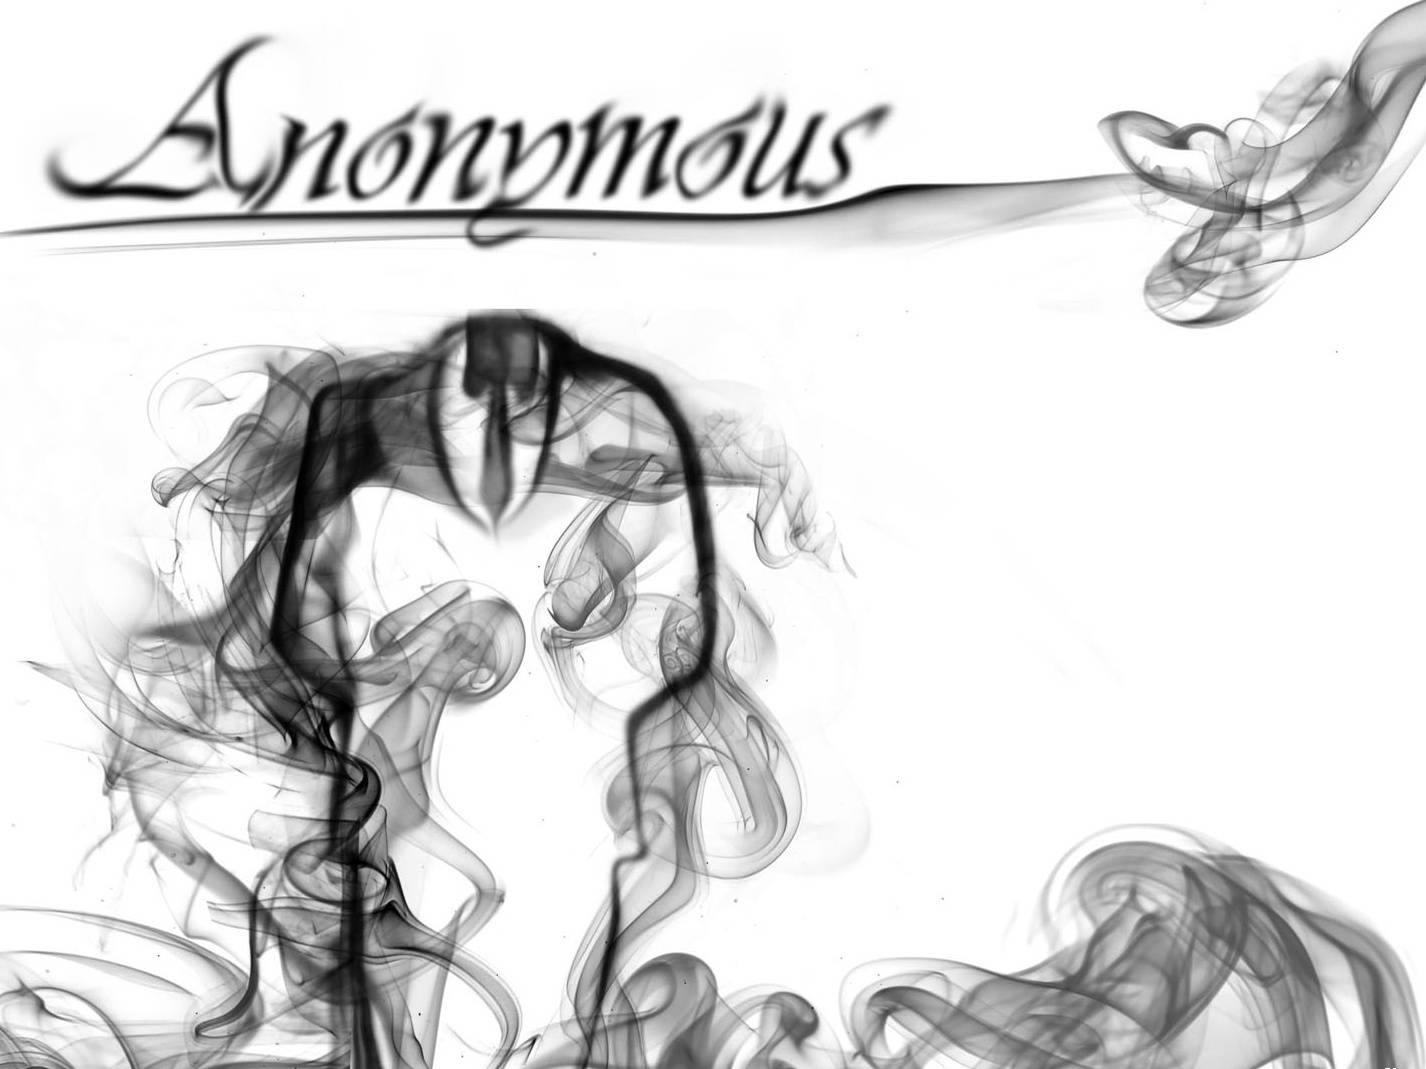 Smokeanonymous